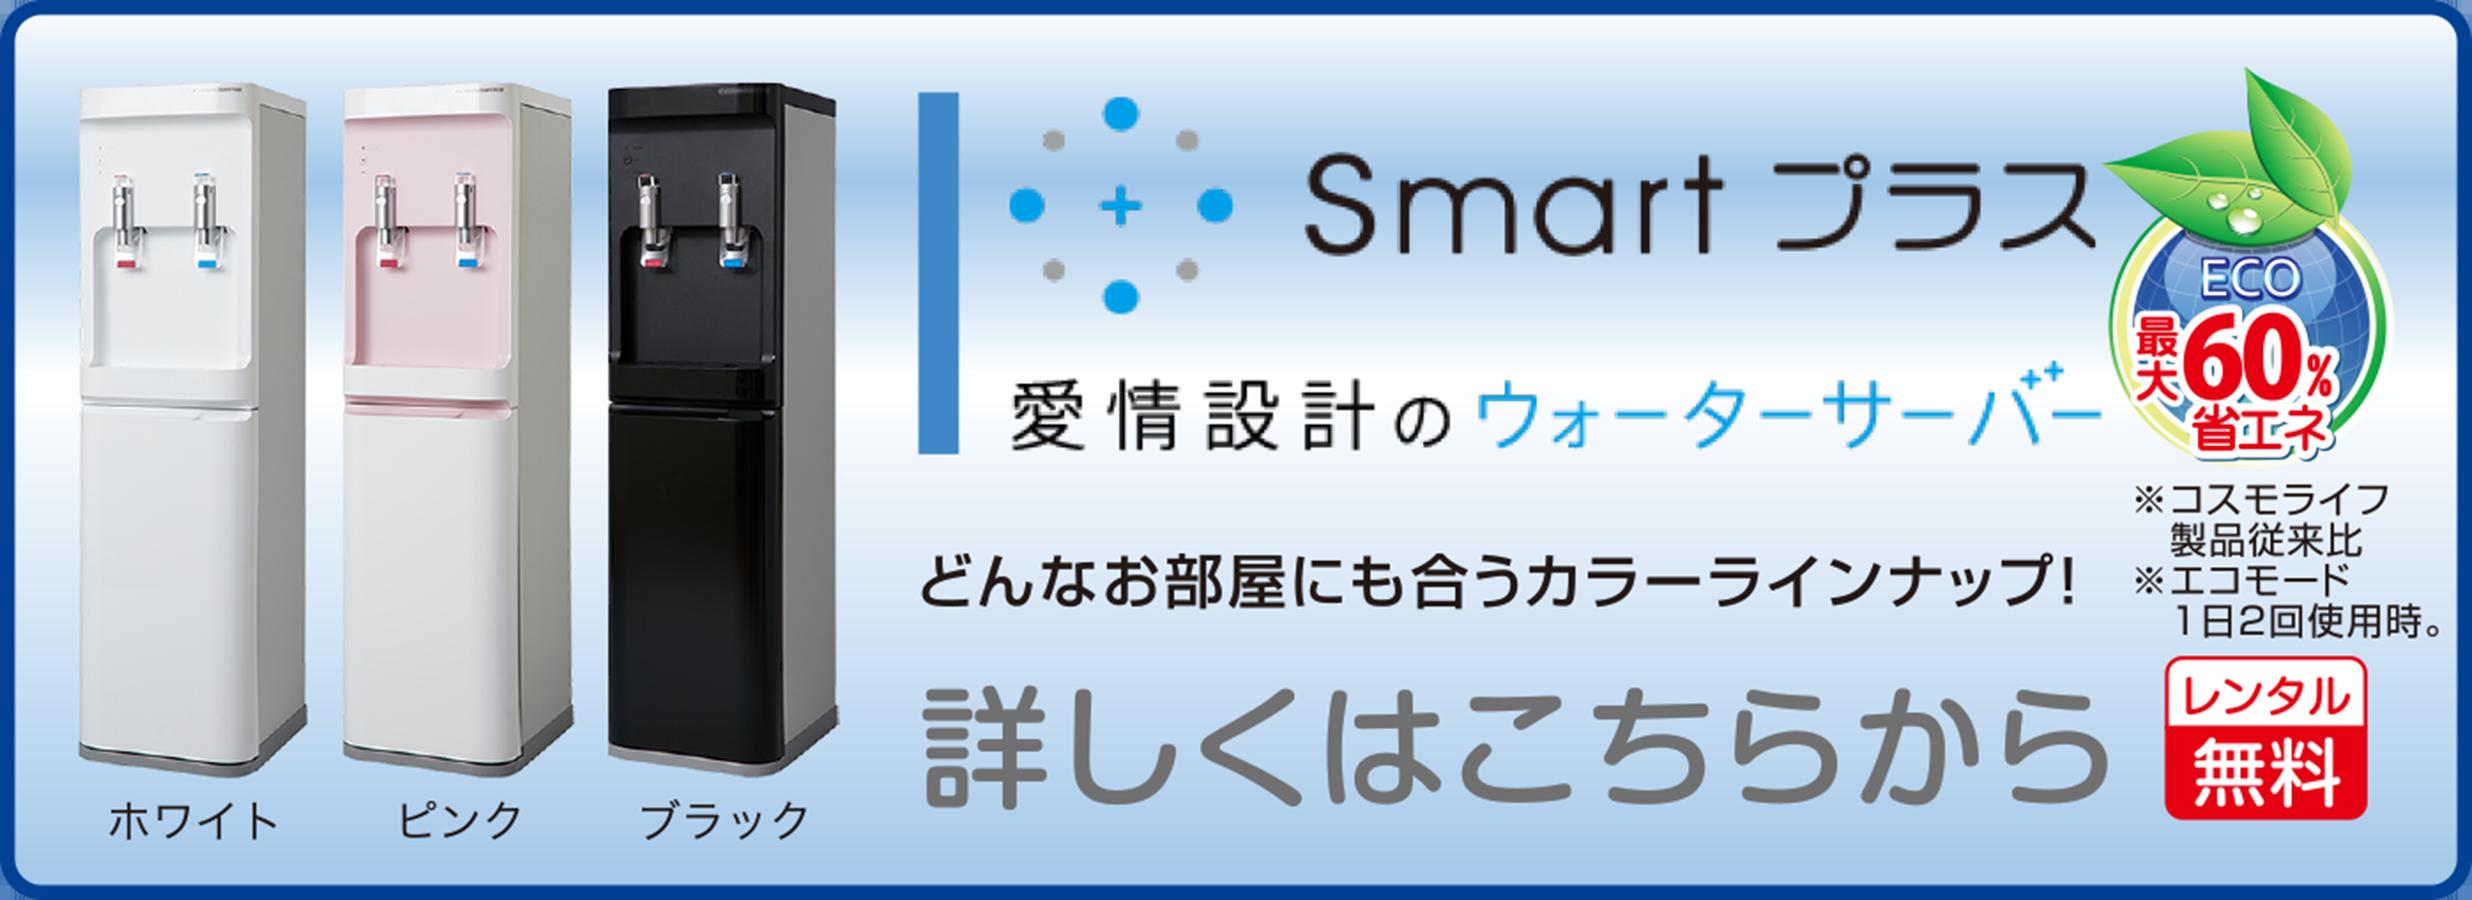 Smart plusサーバー